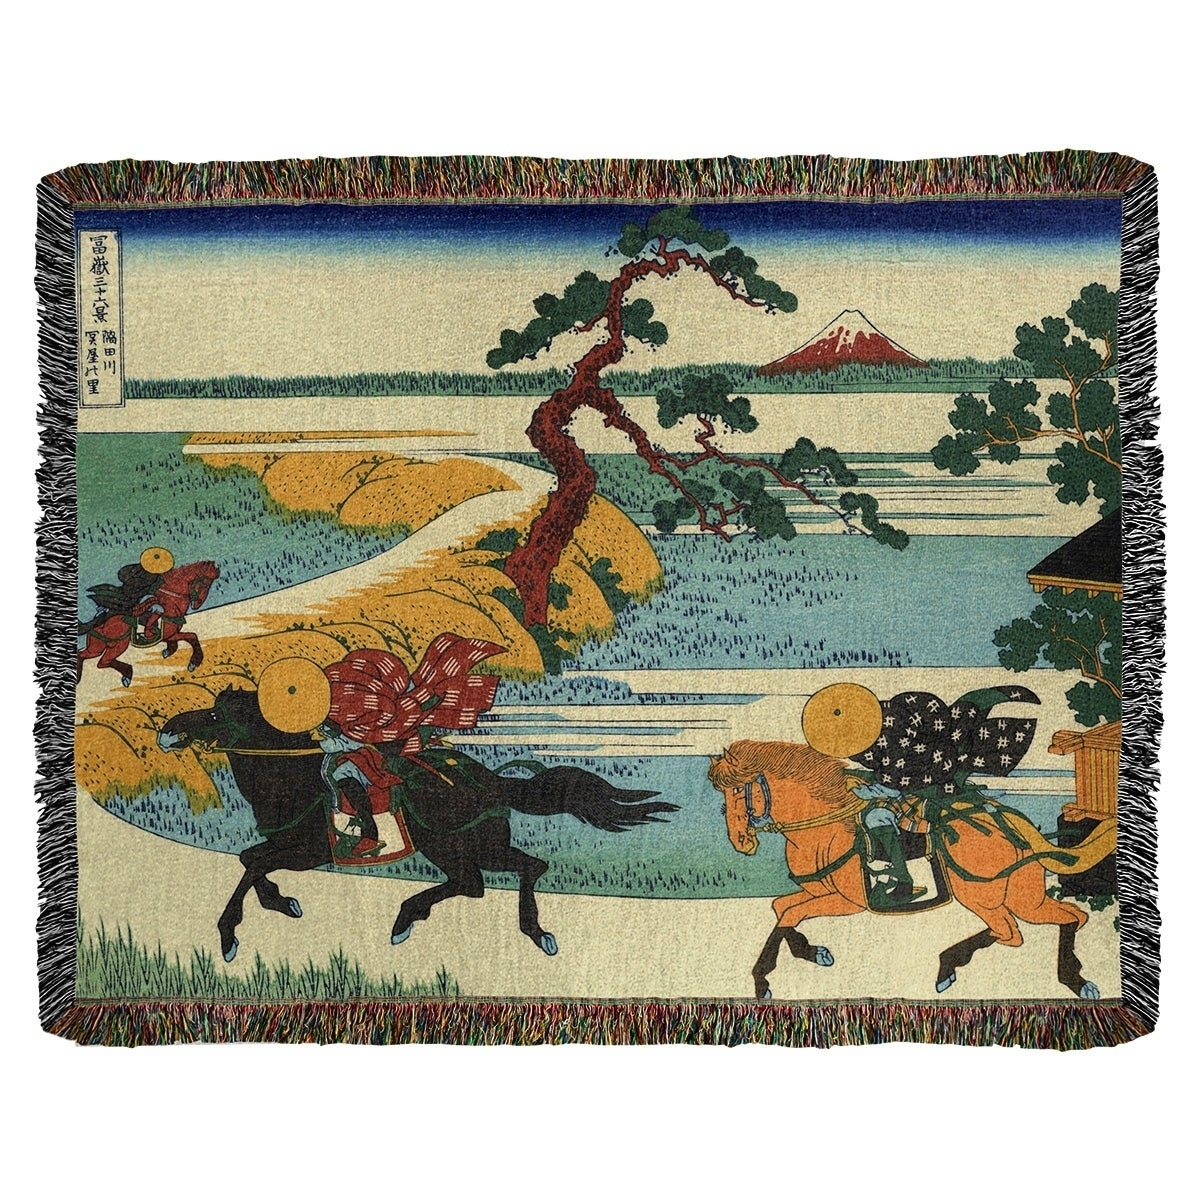 Katsushika Hokusai Sekiya Village At Sumida River Woven Blanket Artwork Content Process Multi 52 X 37 Overstock 27420941